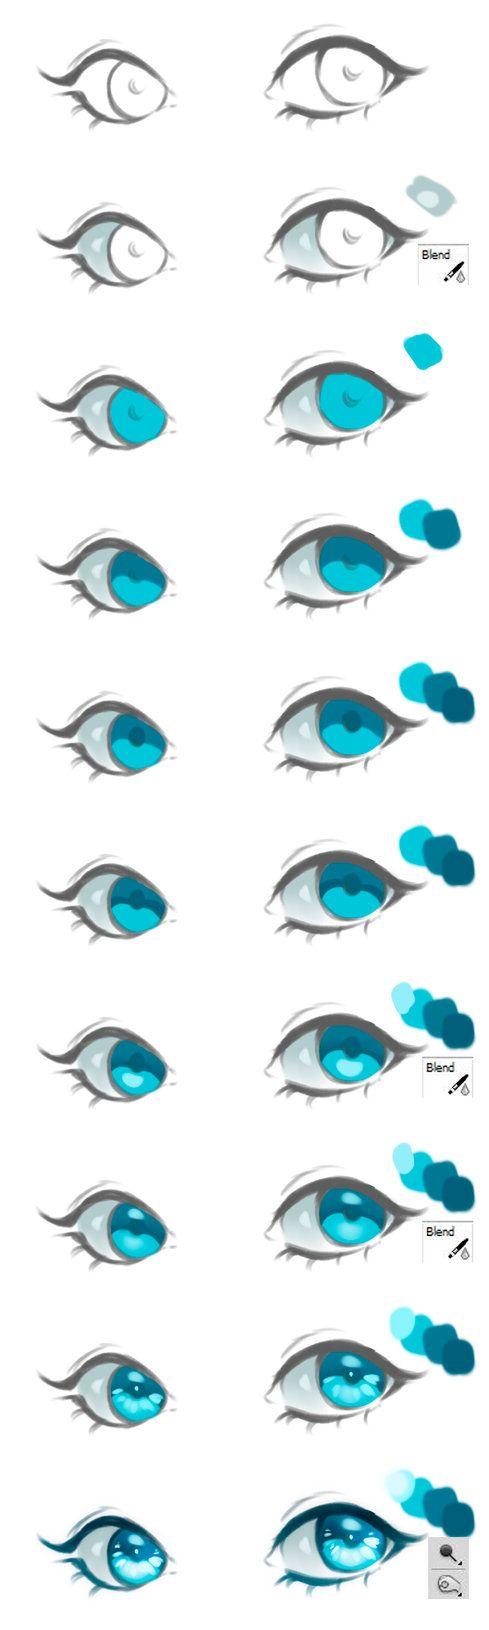 Anime Eyes Coloring Tutorial vol.2 by HaloBlaBla on DeviantArt